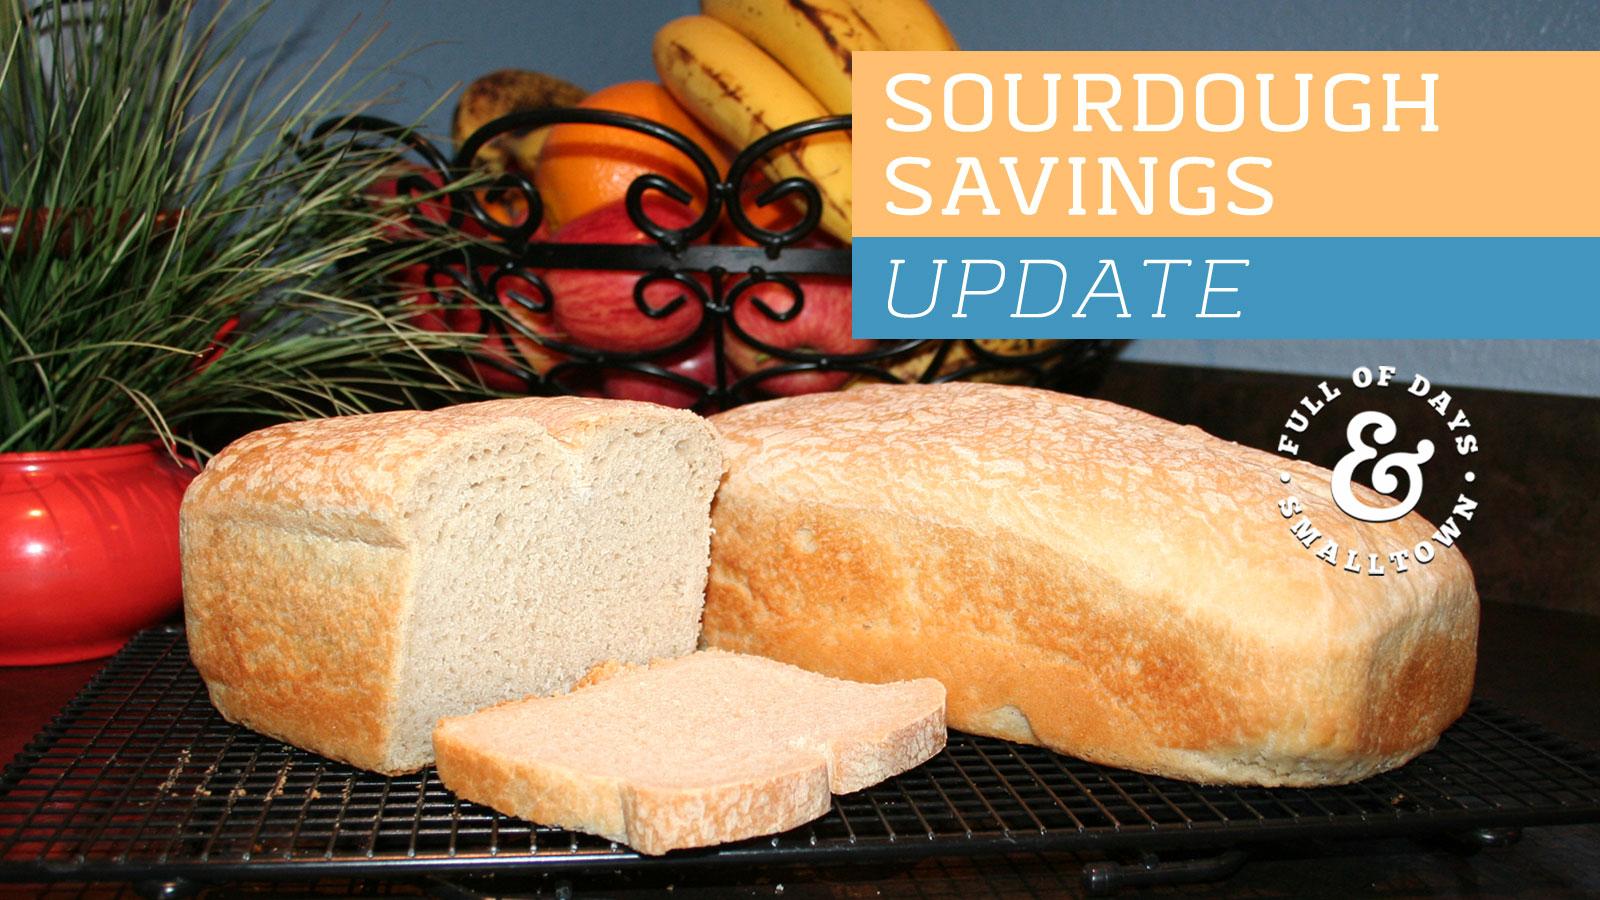 Sourdough Savings Update Full of Days 1600-x-900